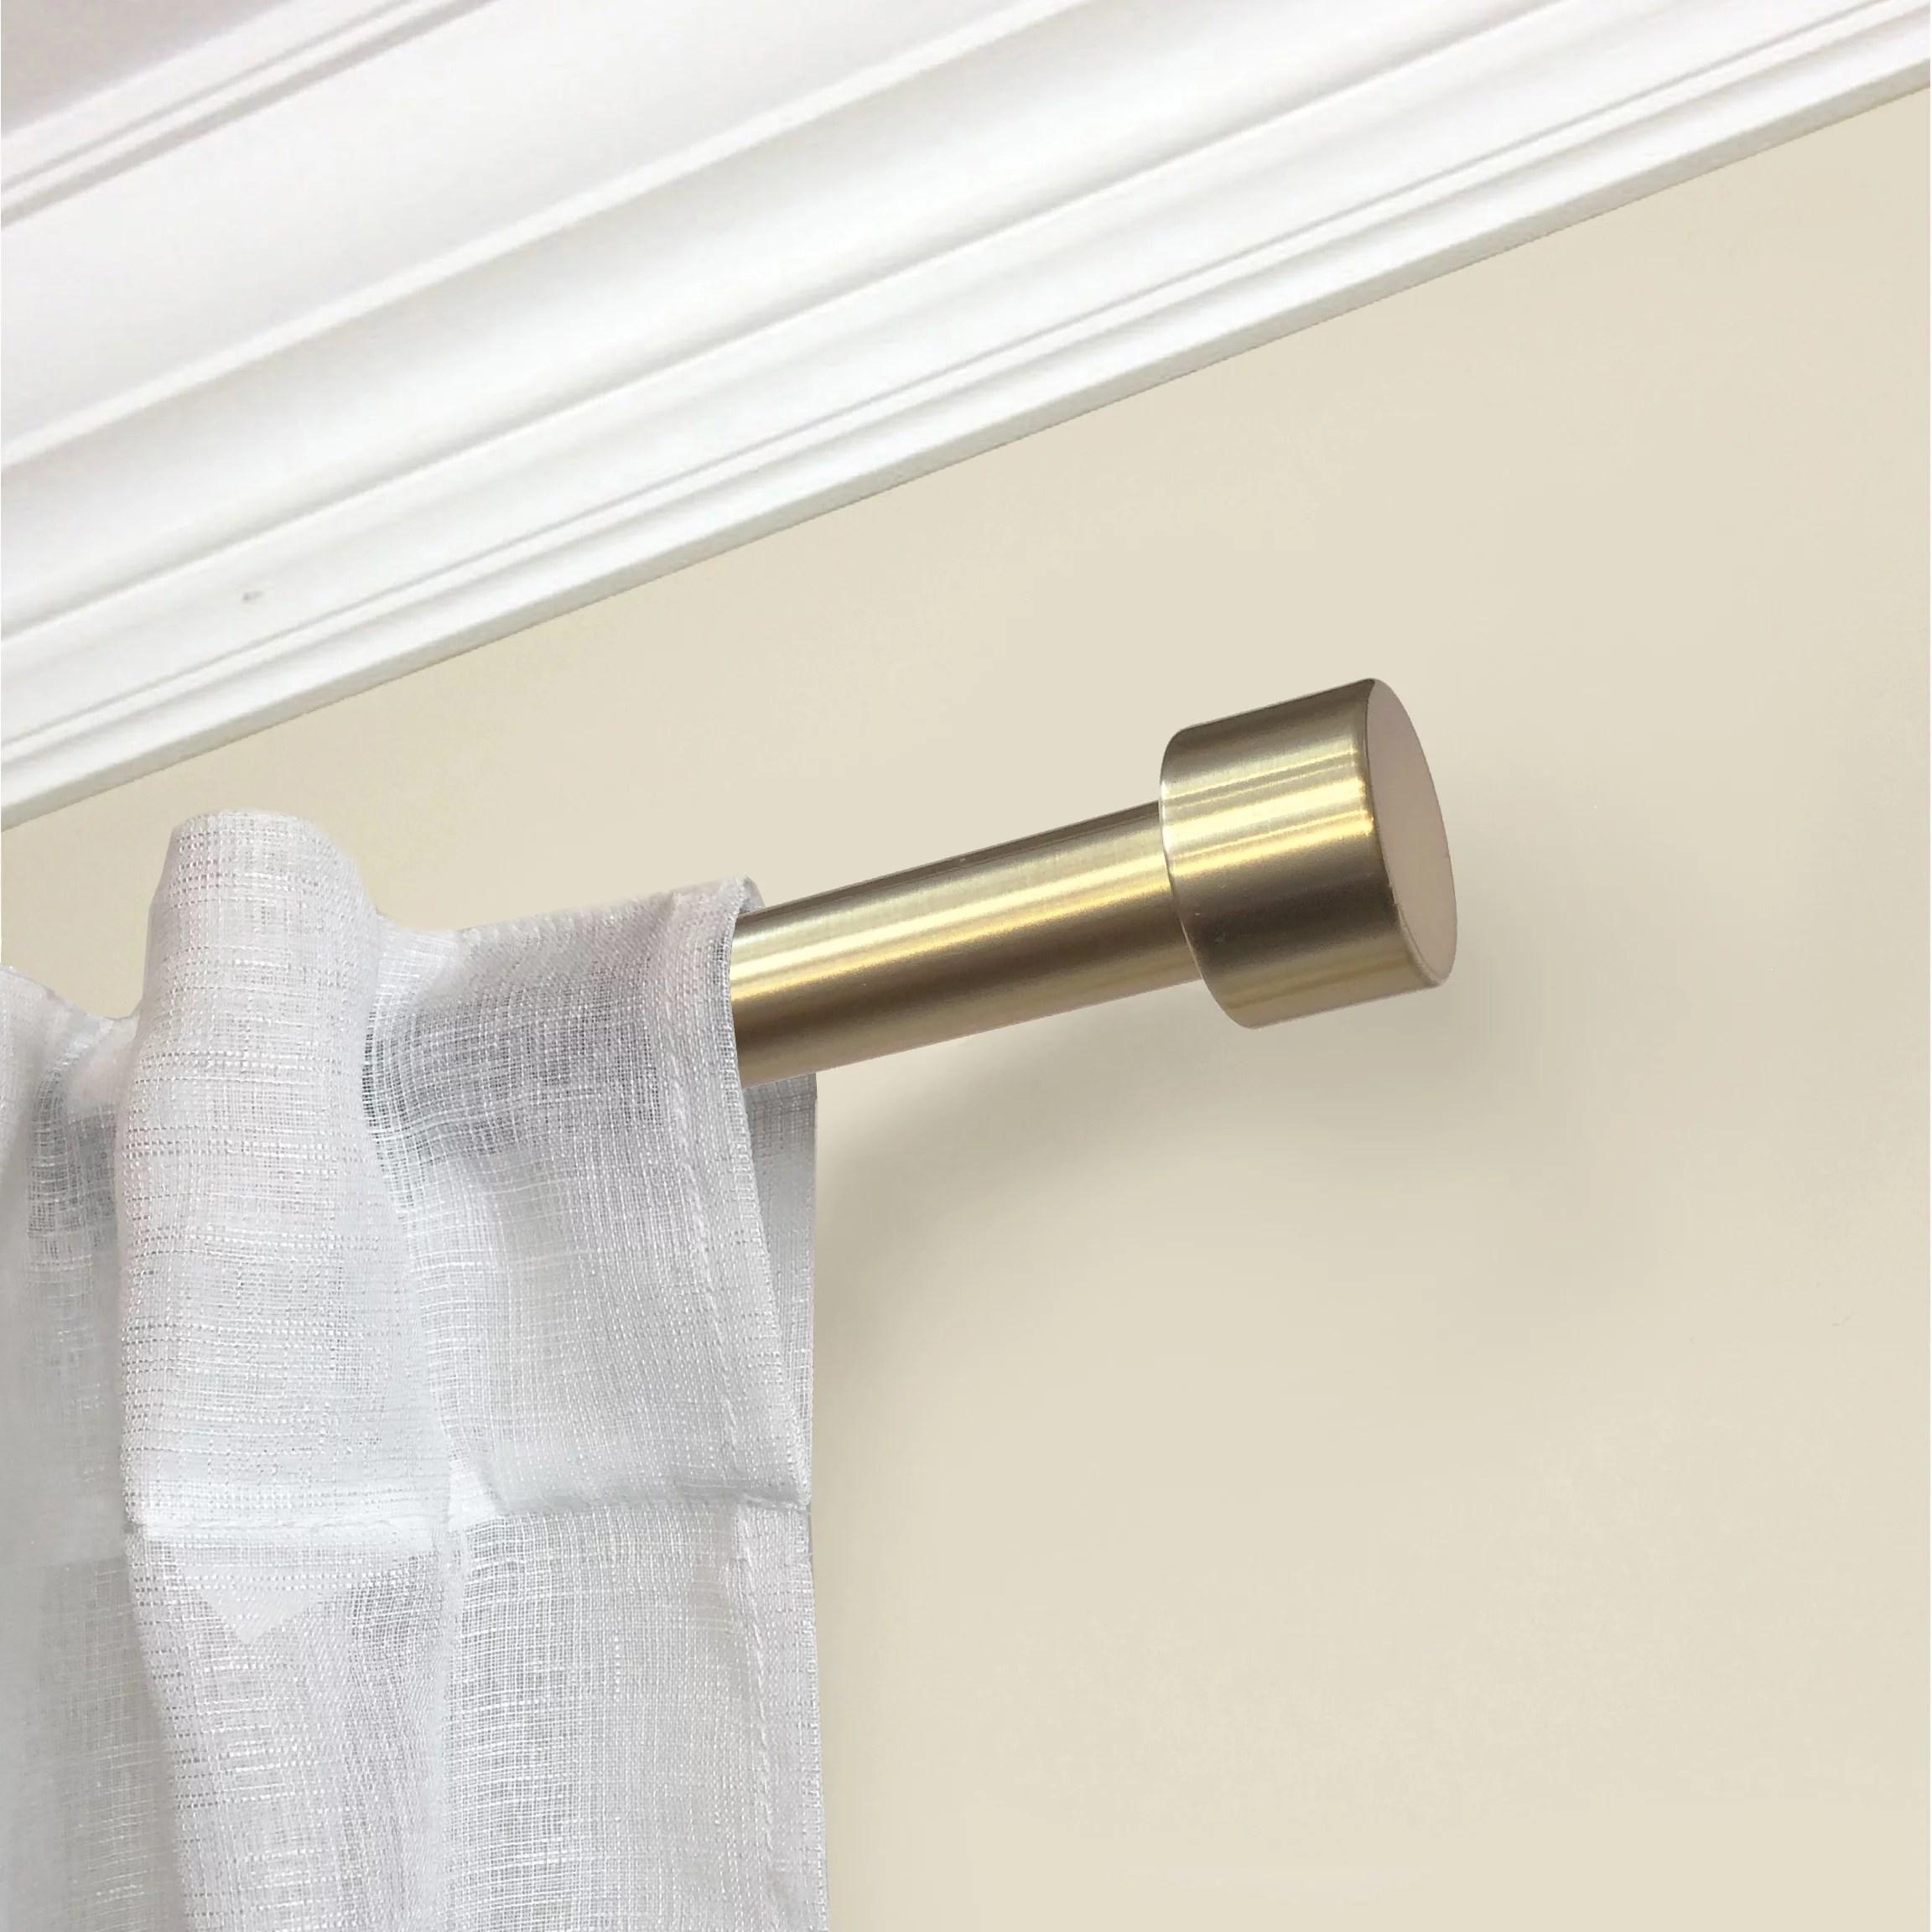 mainstays end cap 3 4 dia 30 84 adjustable curtain rod gold